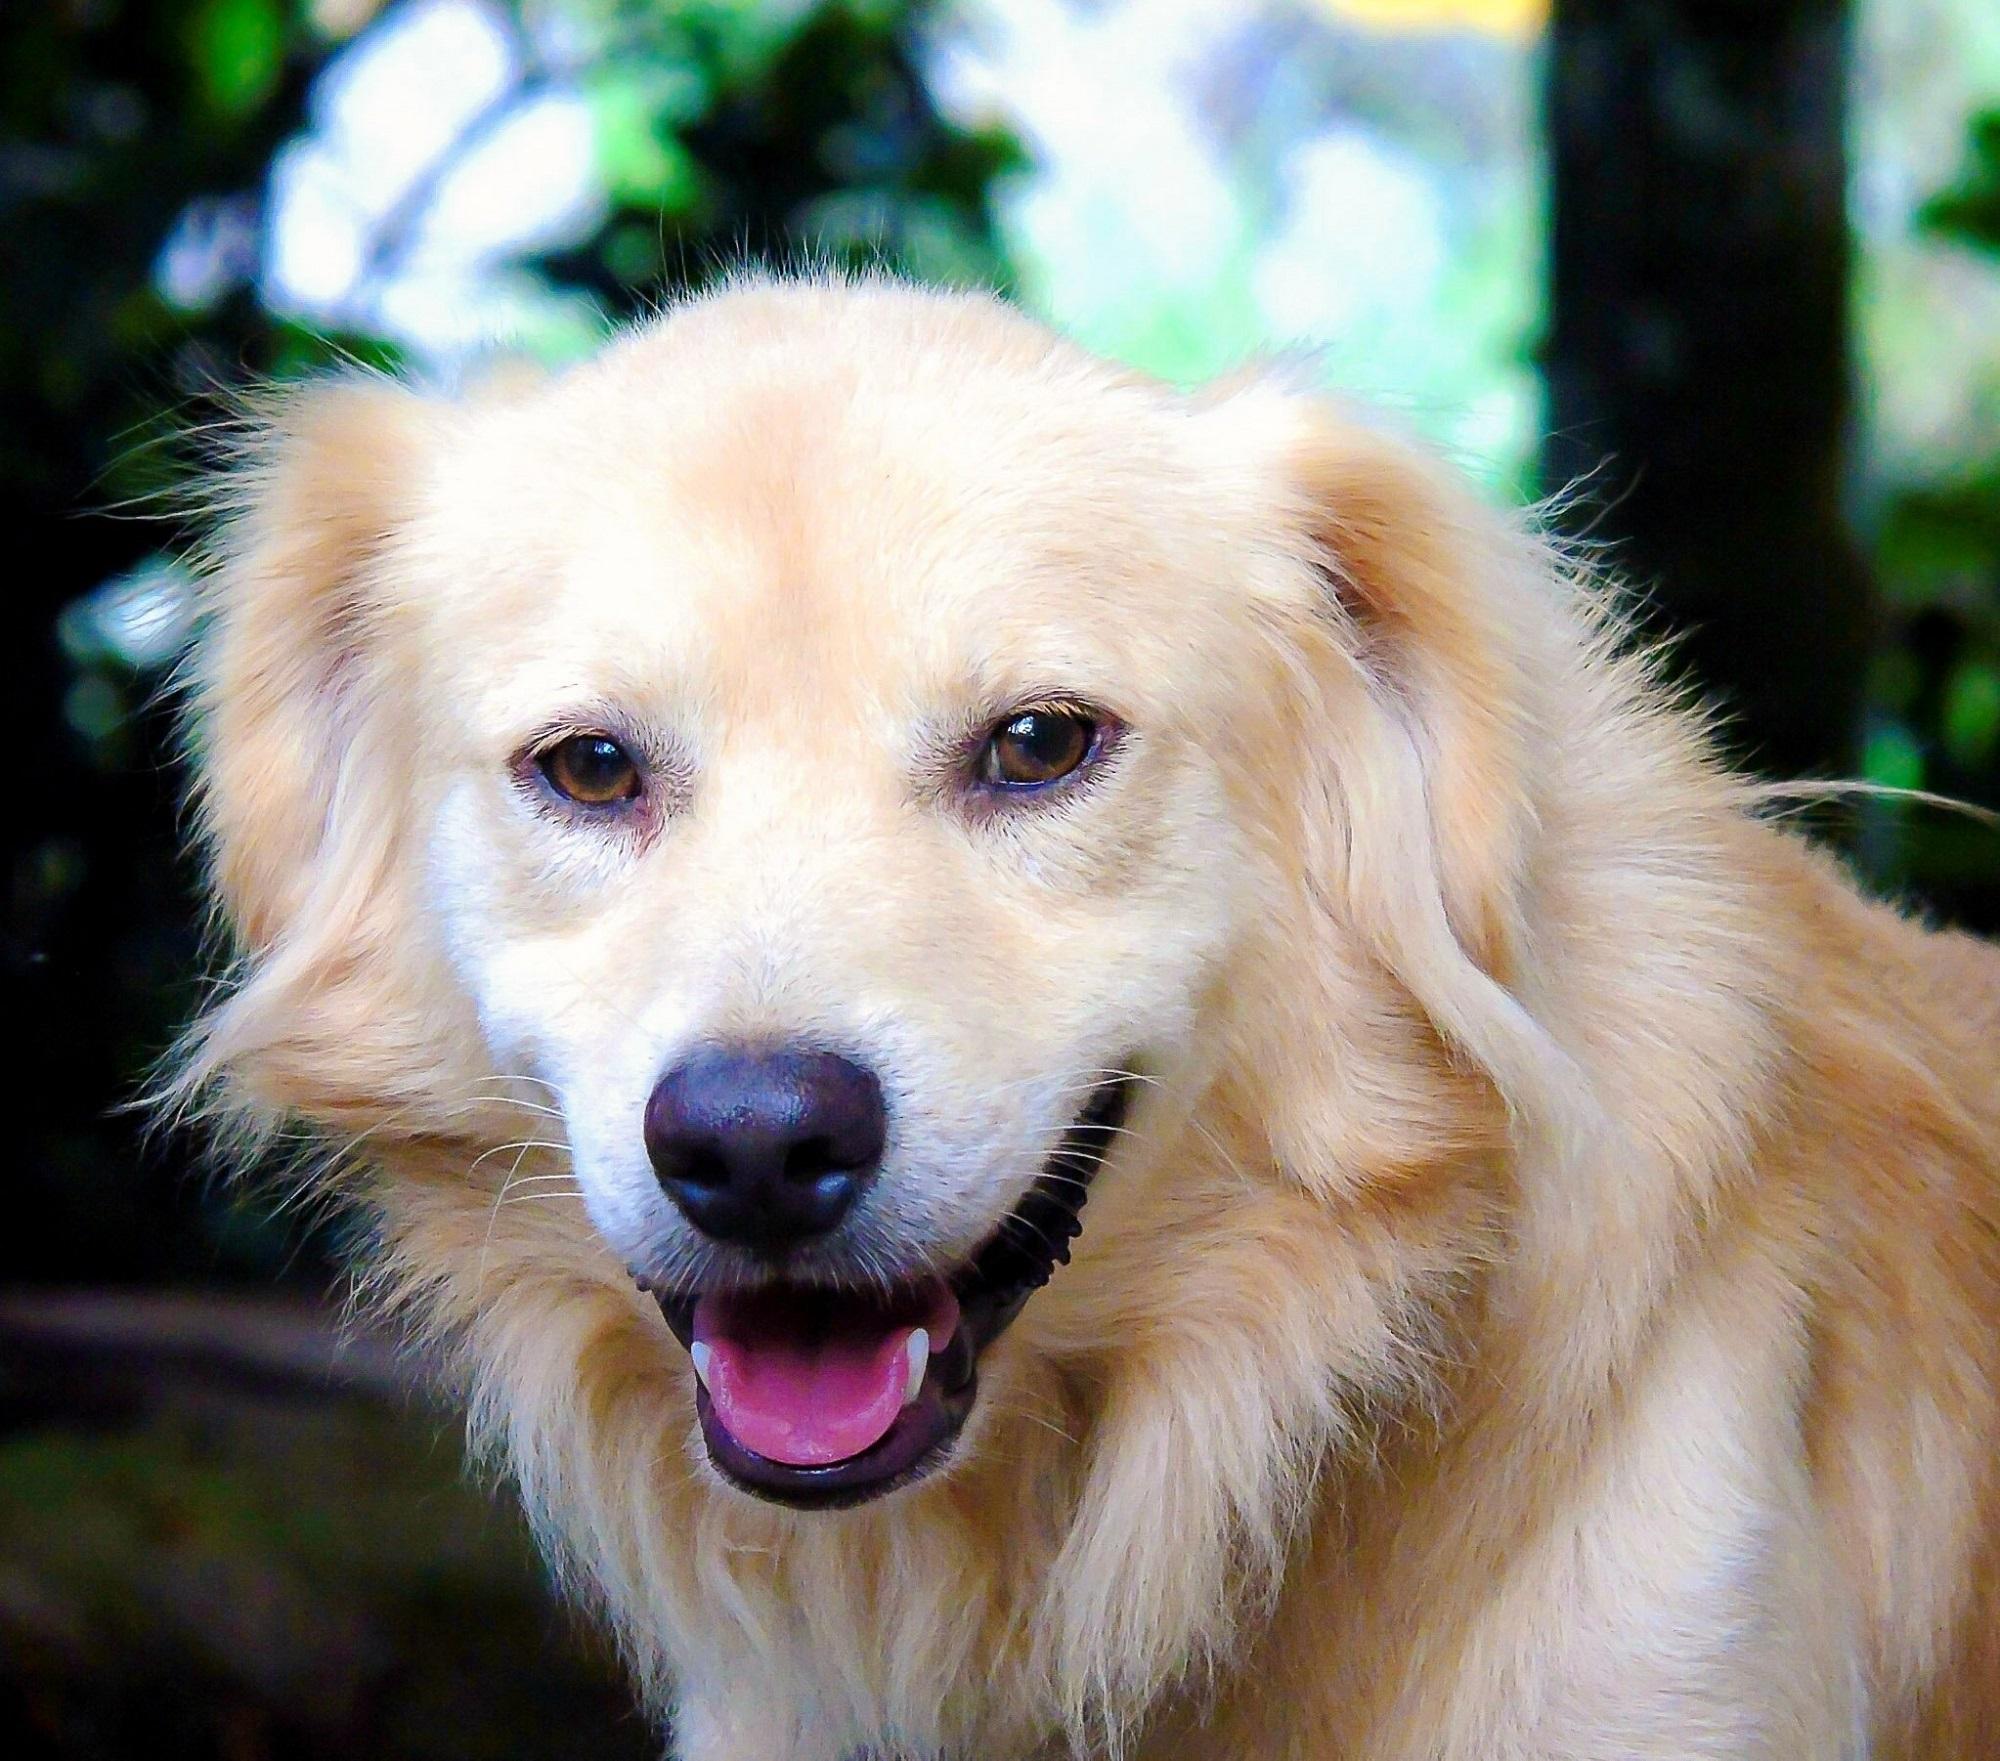 Smiling Dog, Animal, Dog, Friend, Loyal, HQ Photo